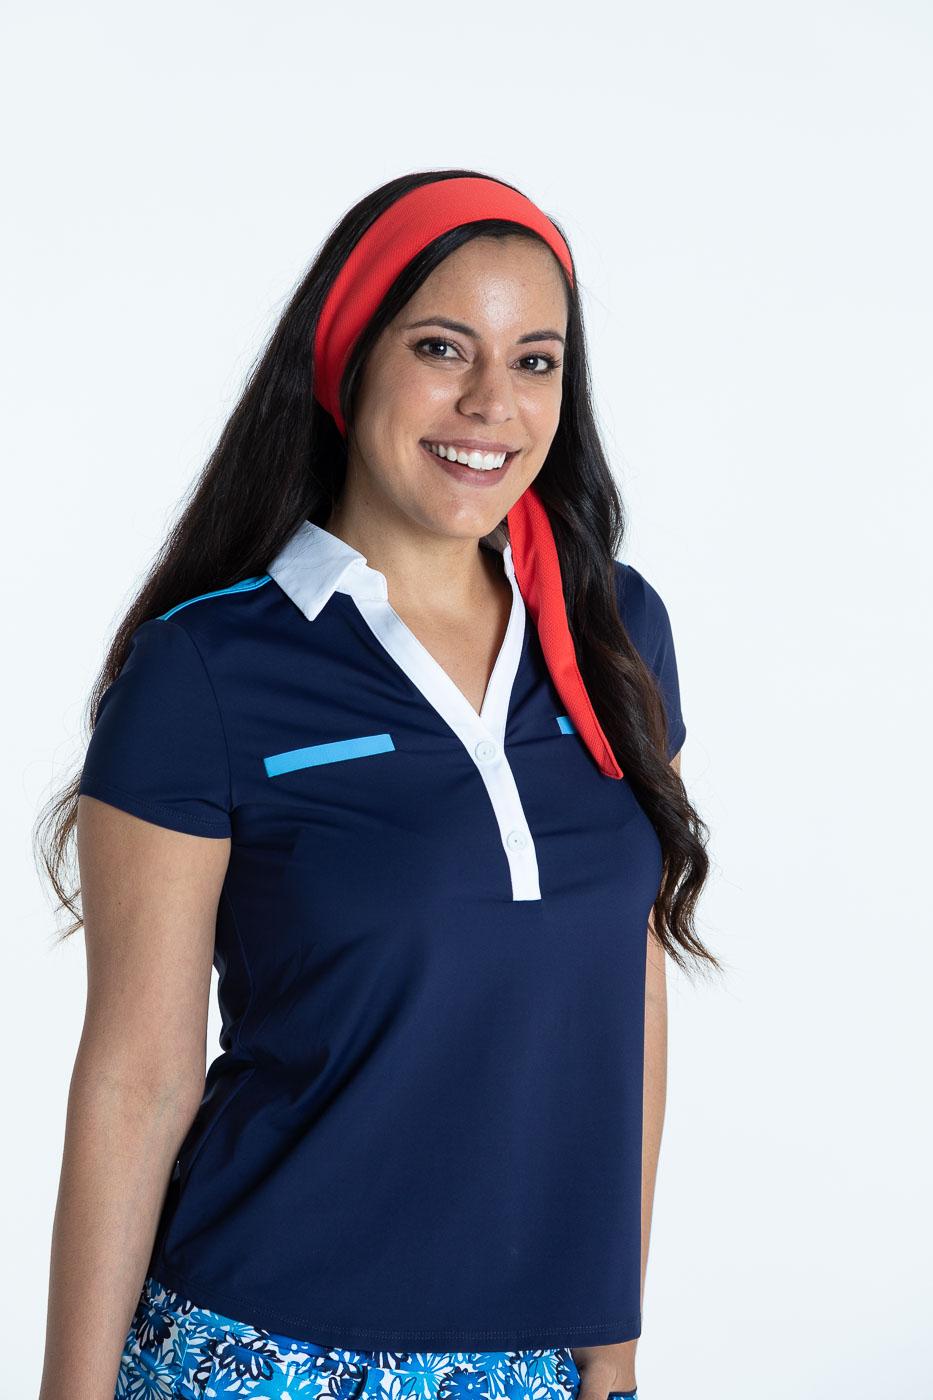 Close up of woman golfer in navy blue Shoulder Opener Shortsleeve Golf Top